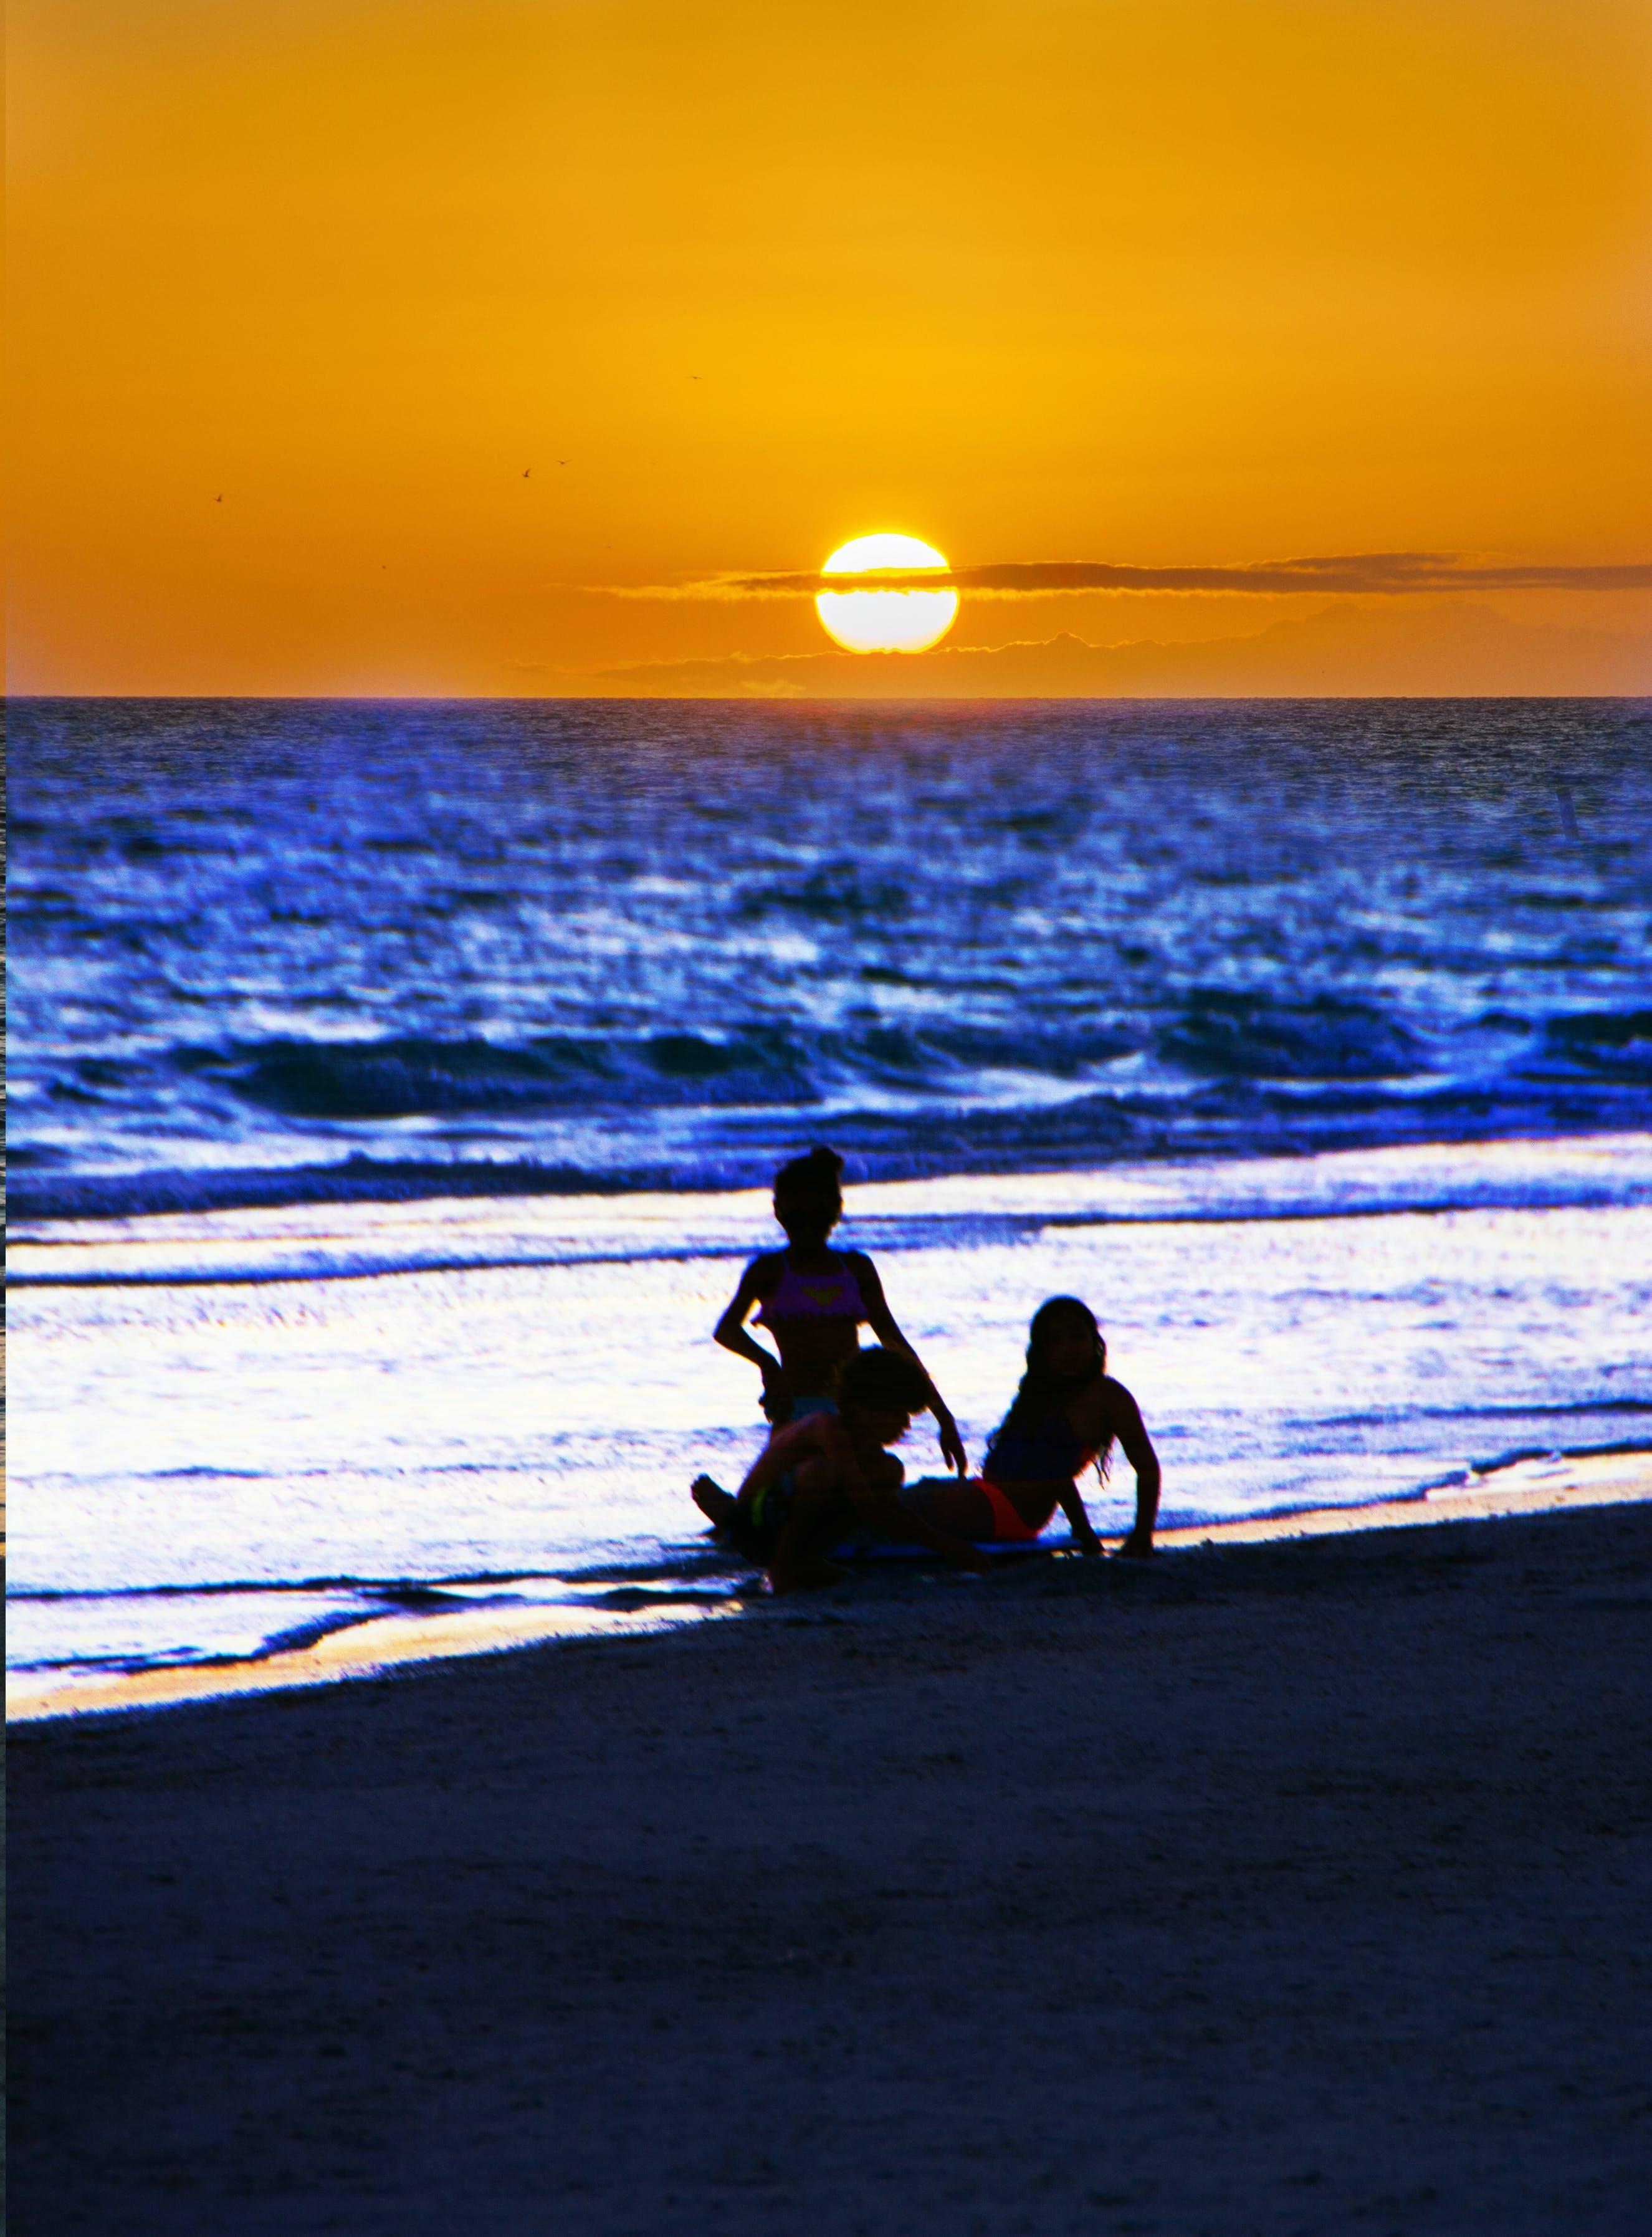 Free stock photo of sunset view at beach